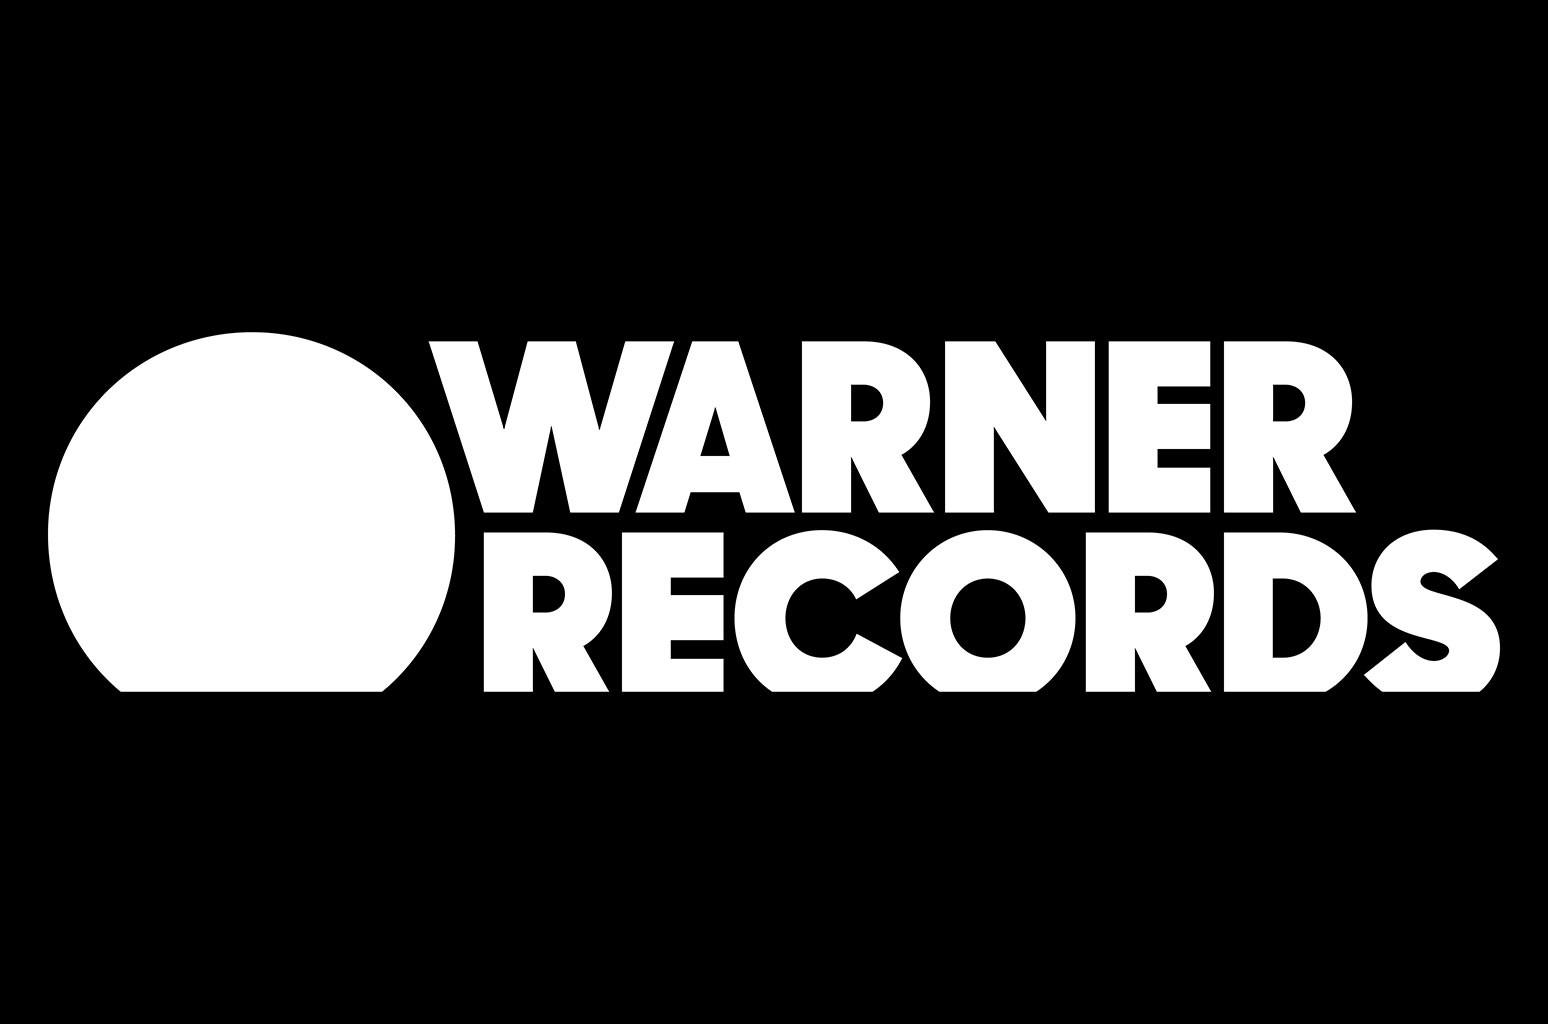 Warner-Records-logo-NEW-2019-billboard-1548-1559059071